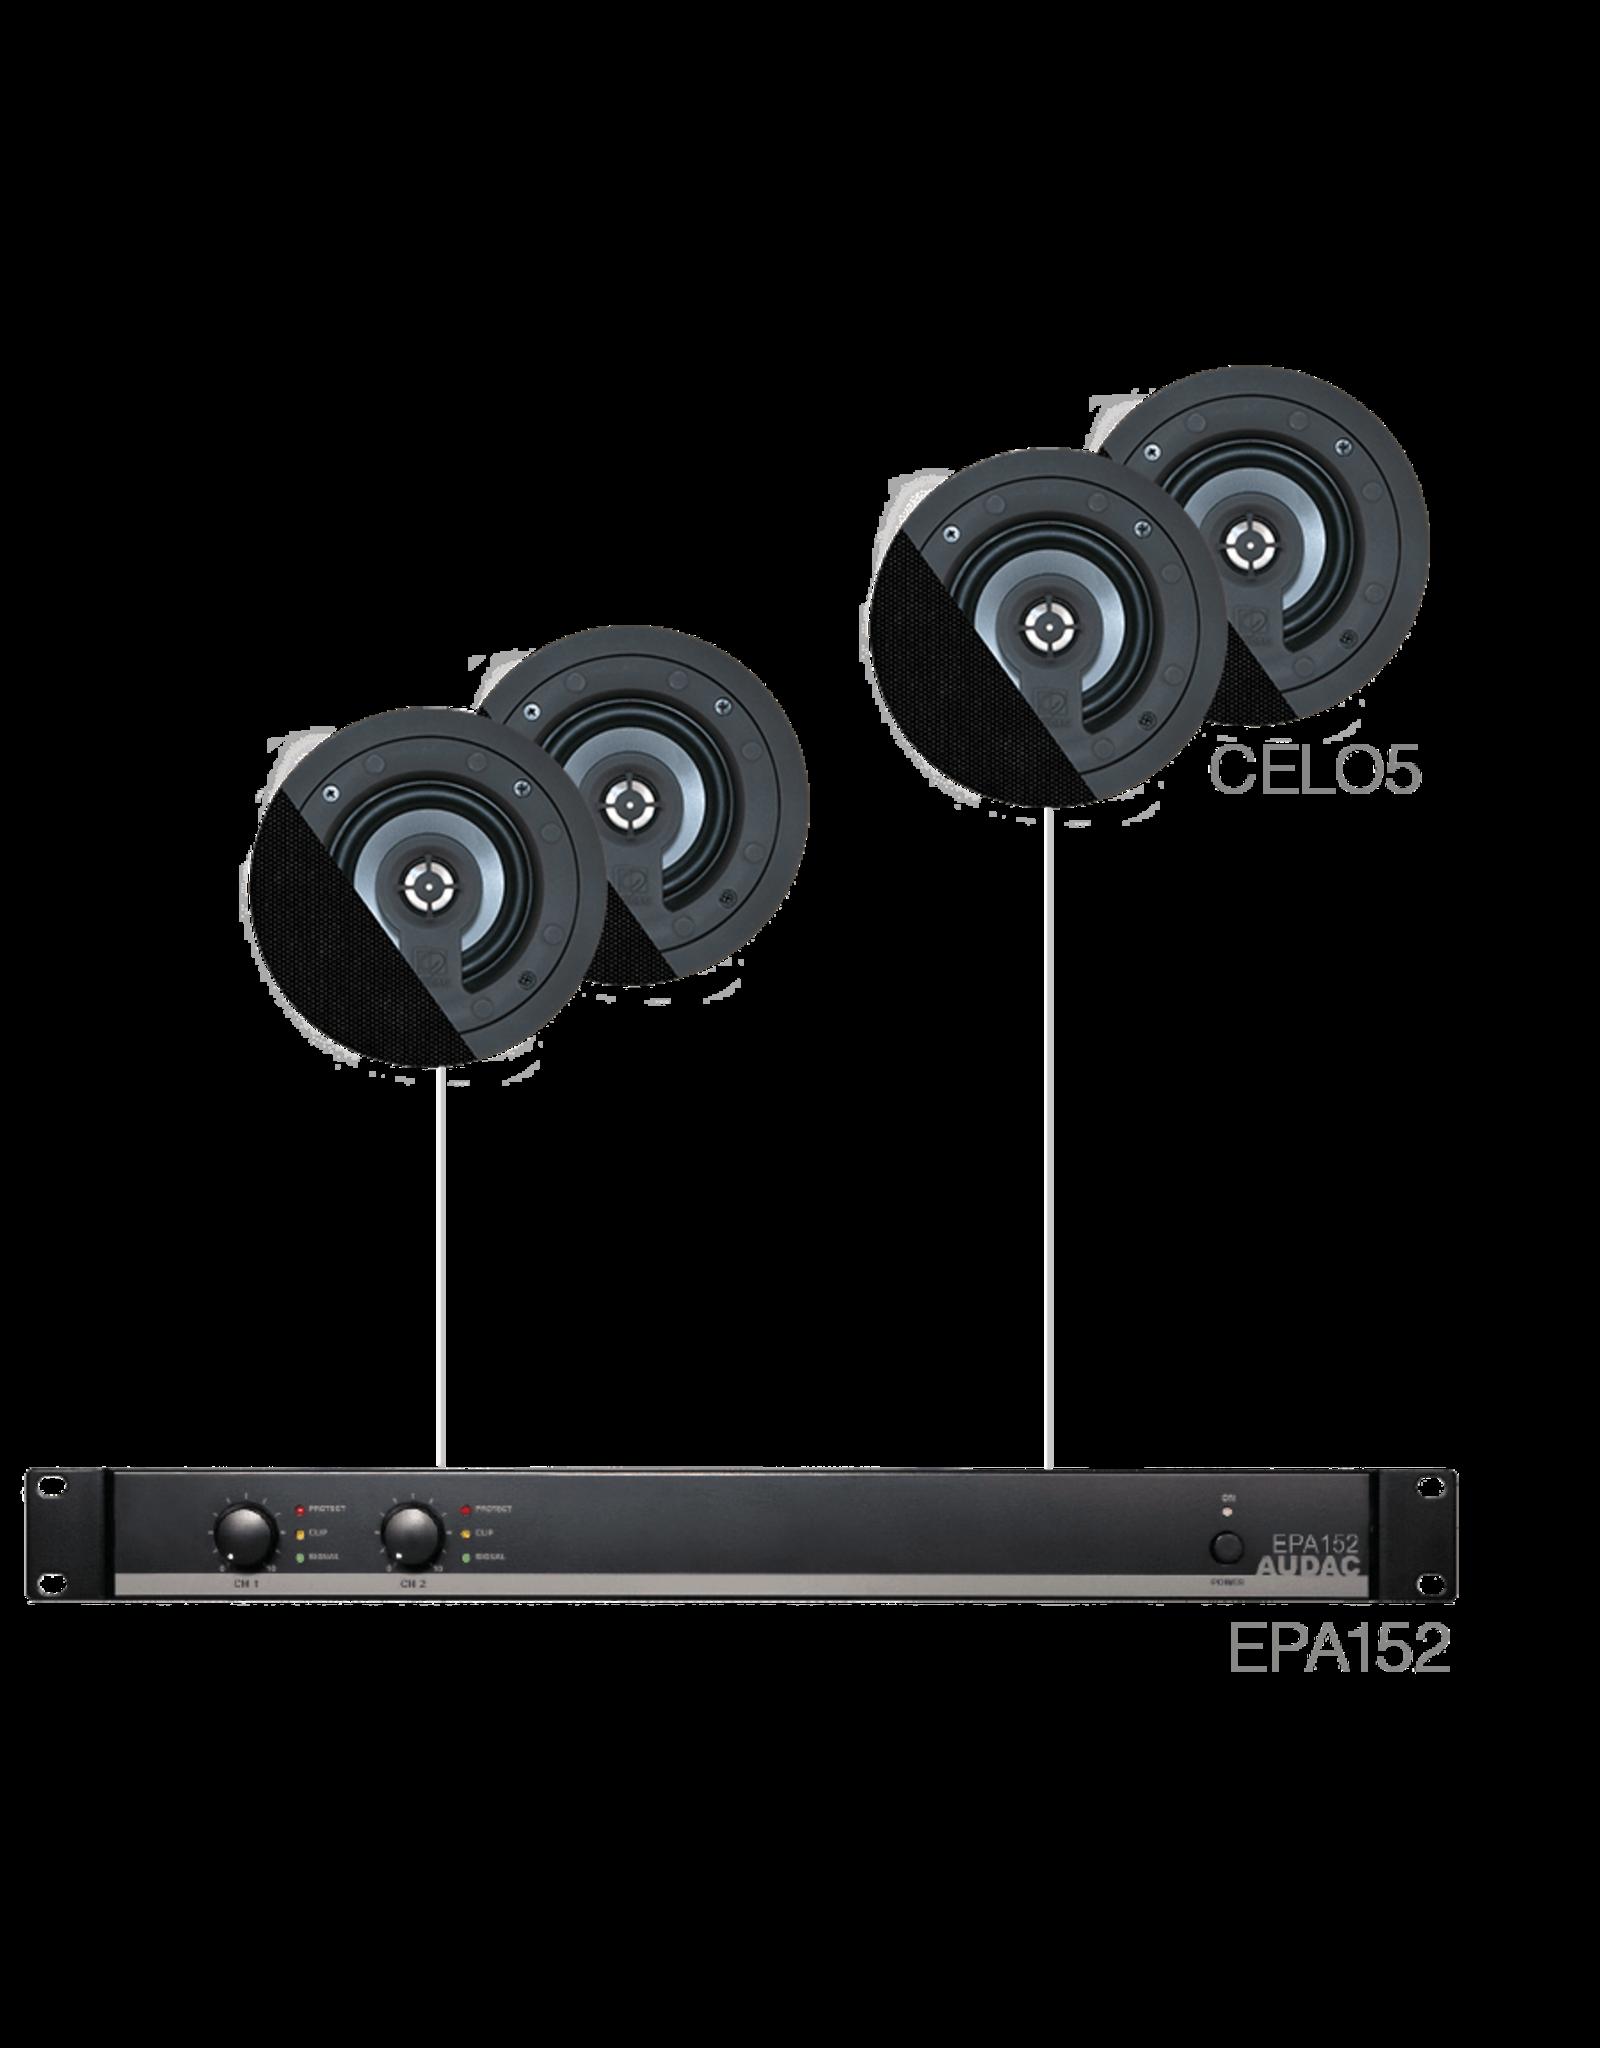 Audac 4 x CELO5 + EPA152 Black